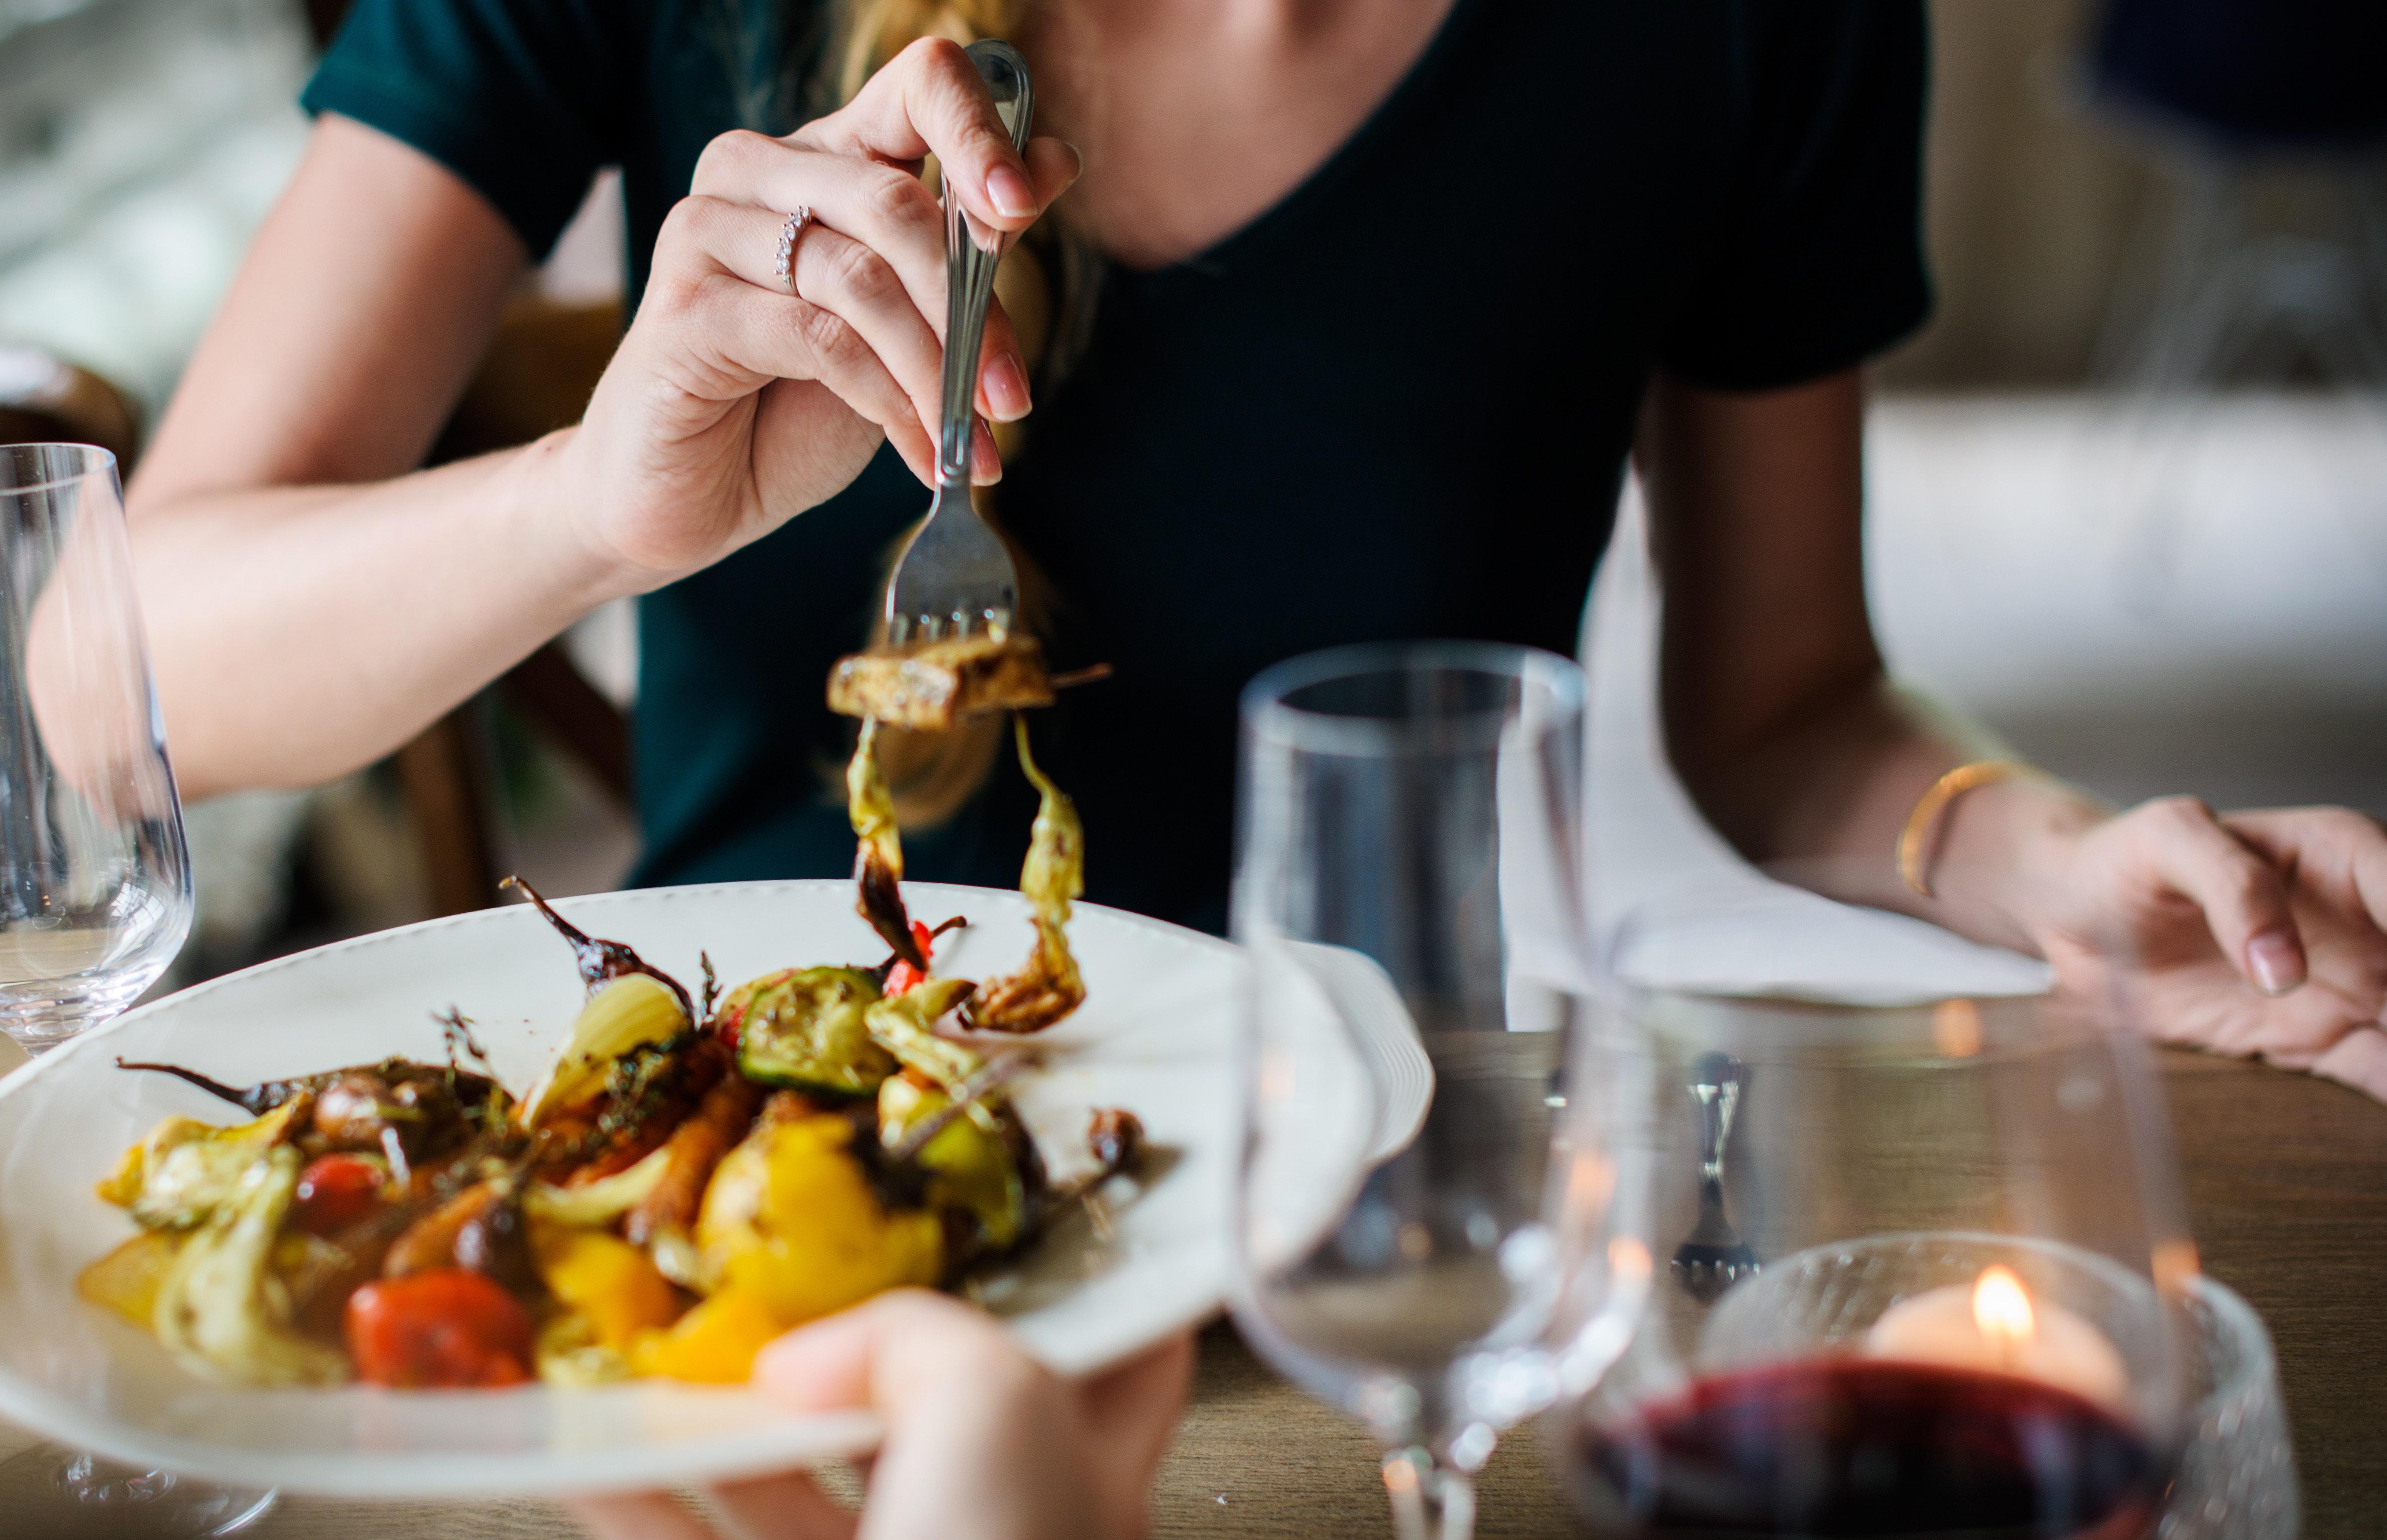 woman eating roasted vegetables